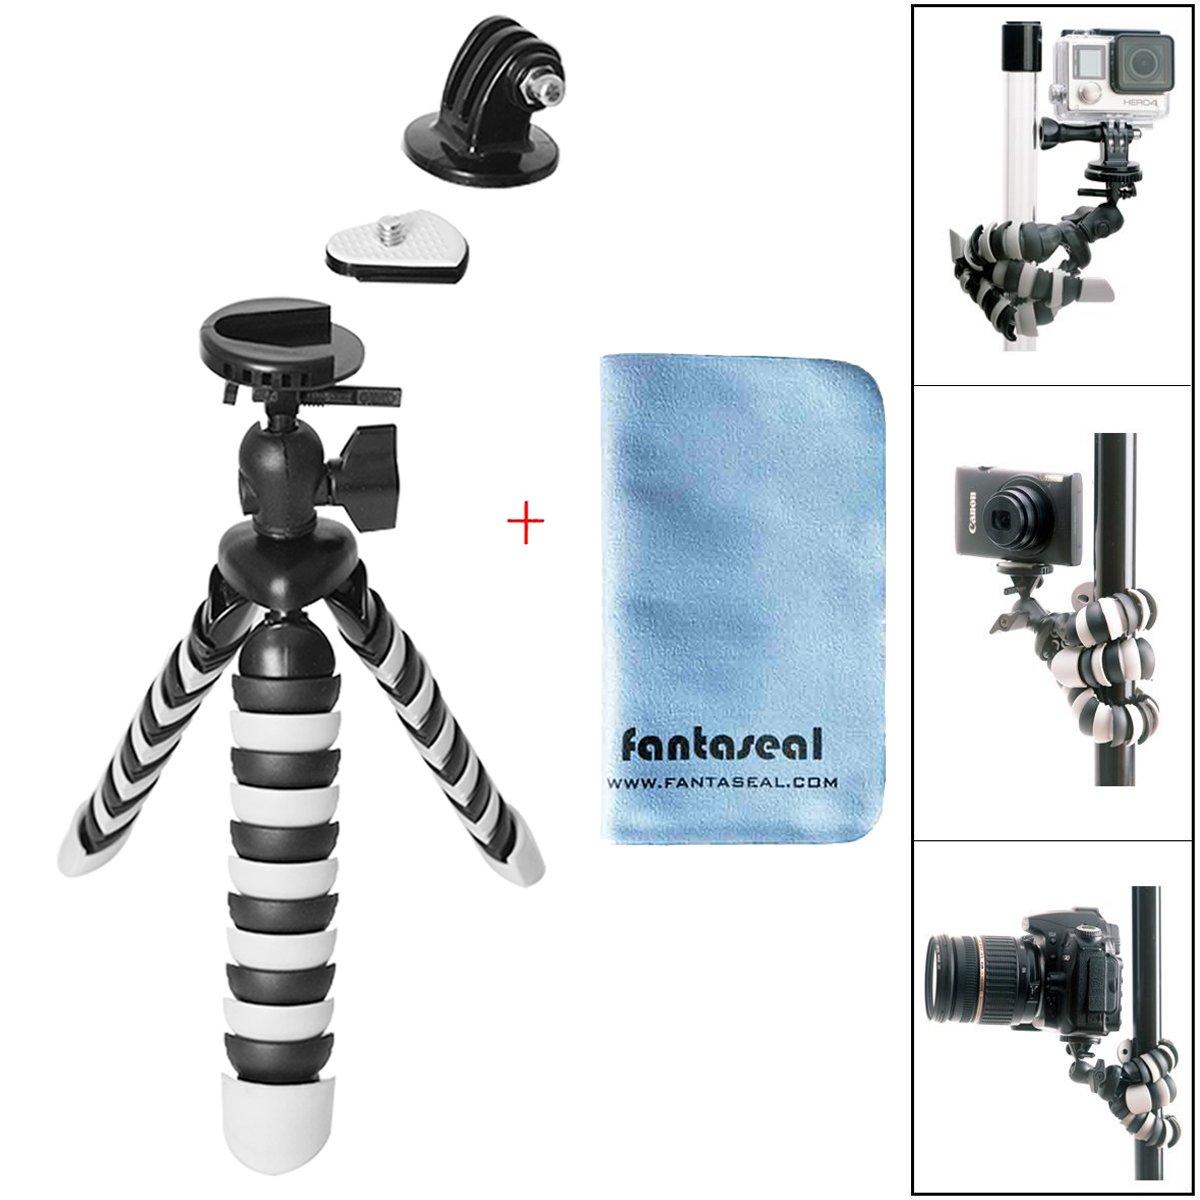 Cheap Mini Camera Tripod Flexible Find Mini Camera Tripod Flexible